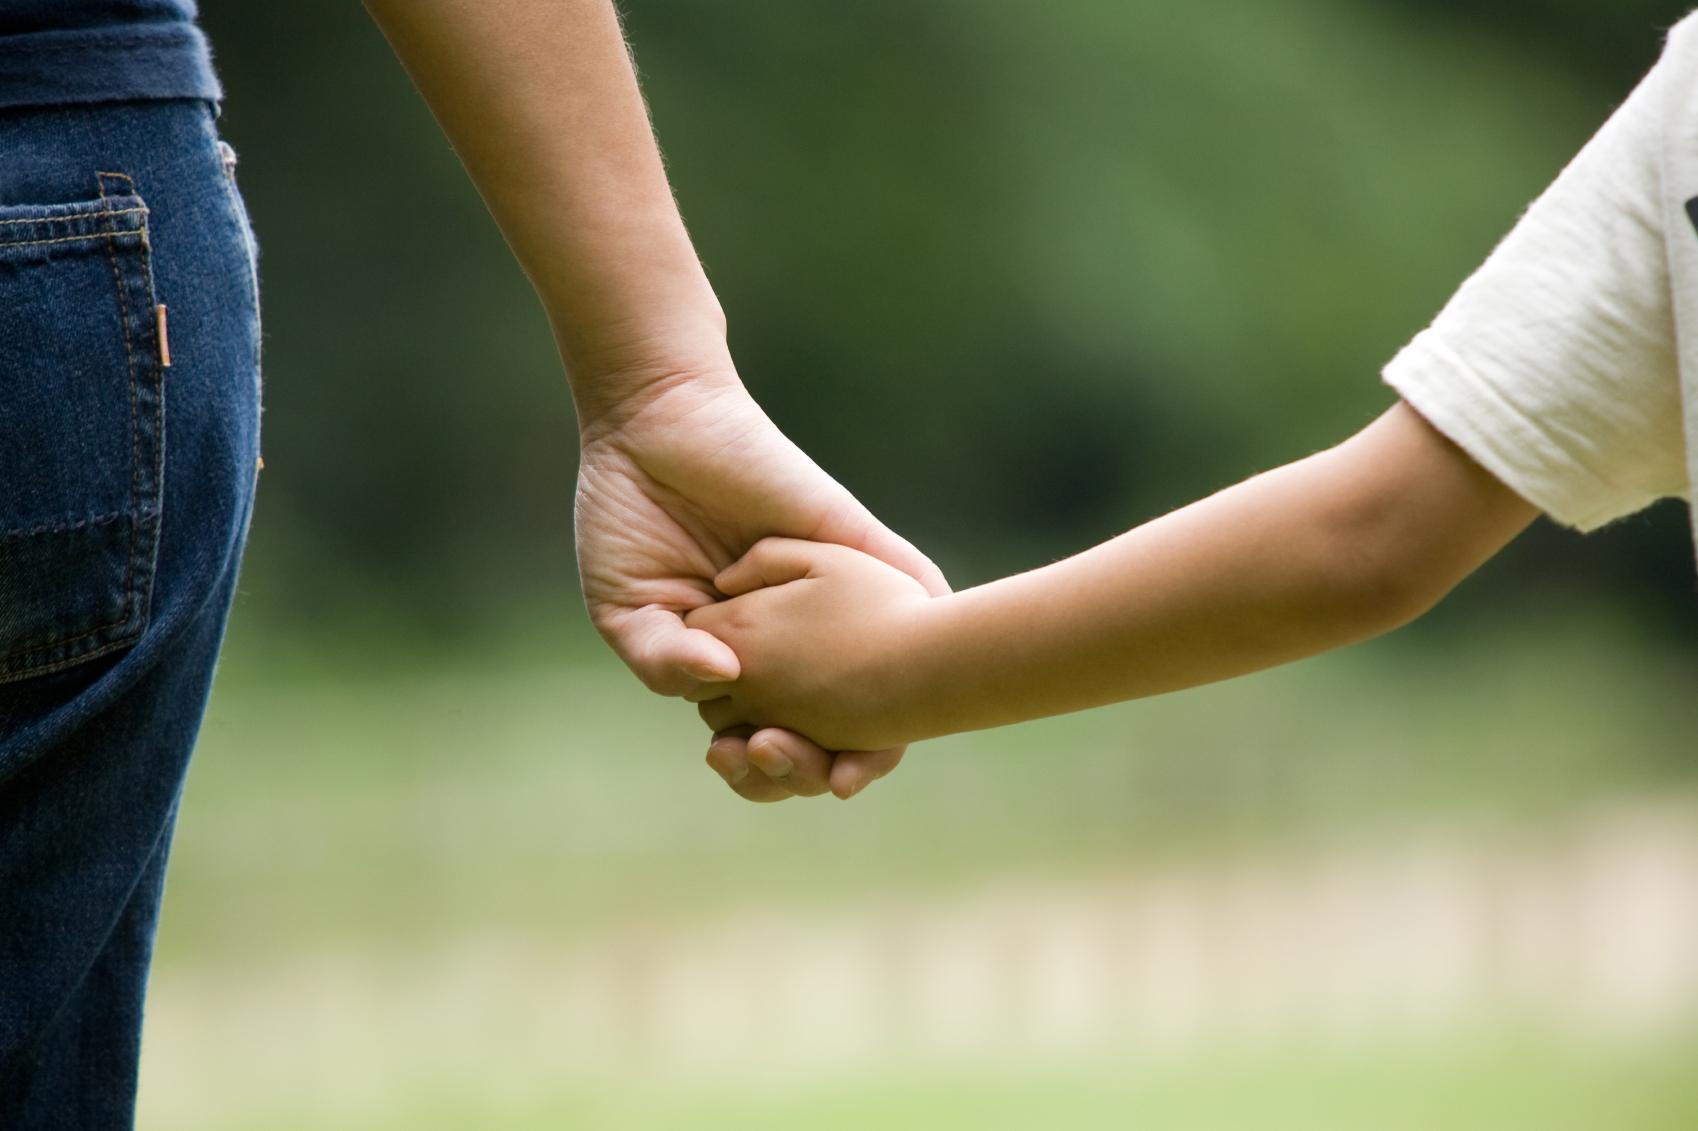 los angeles child custody lawyer advice